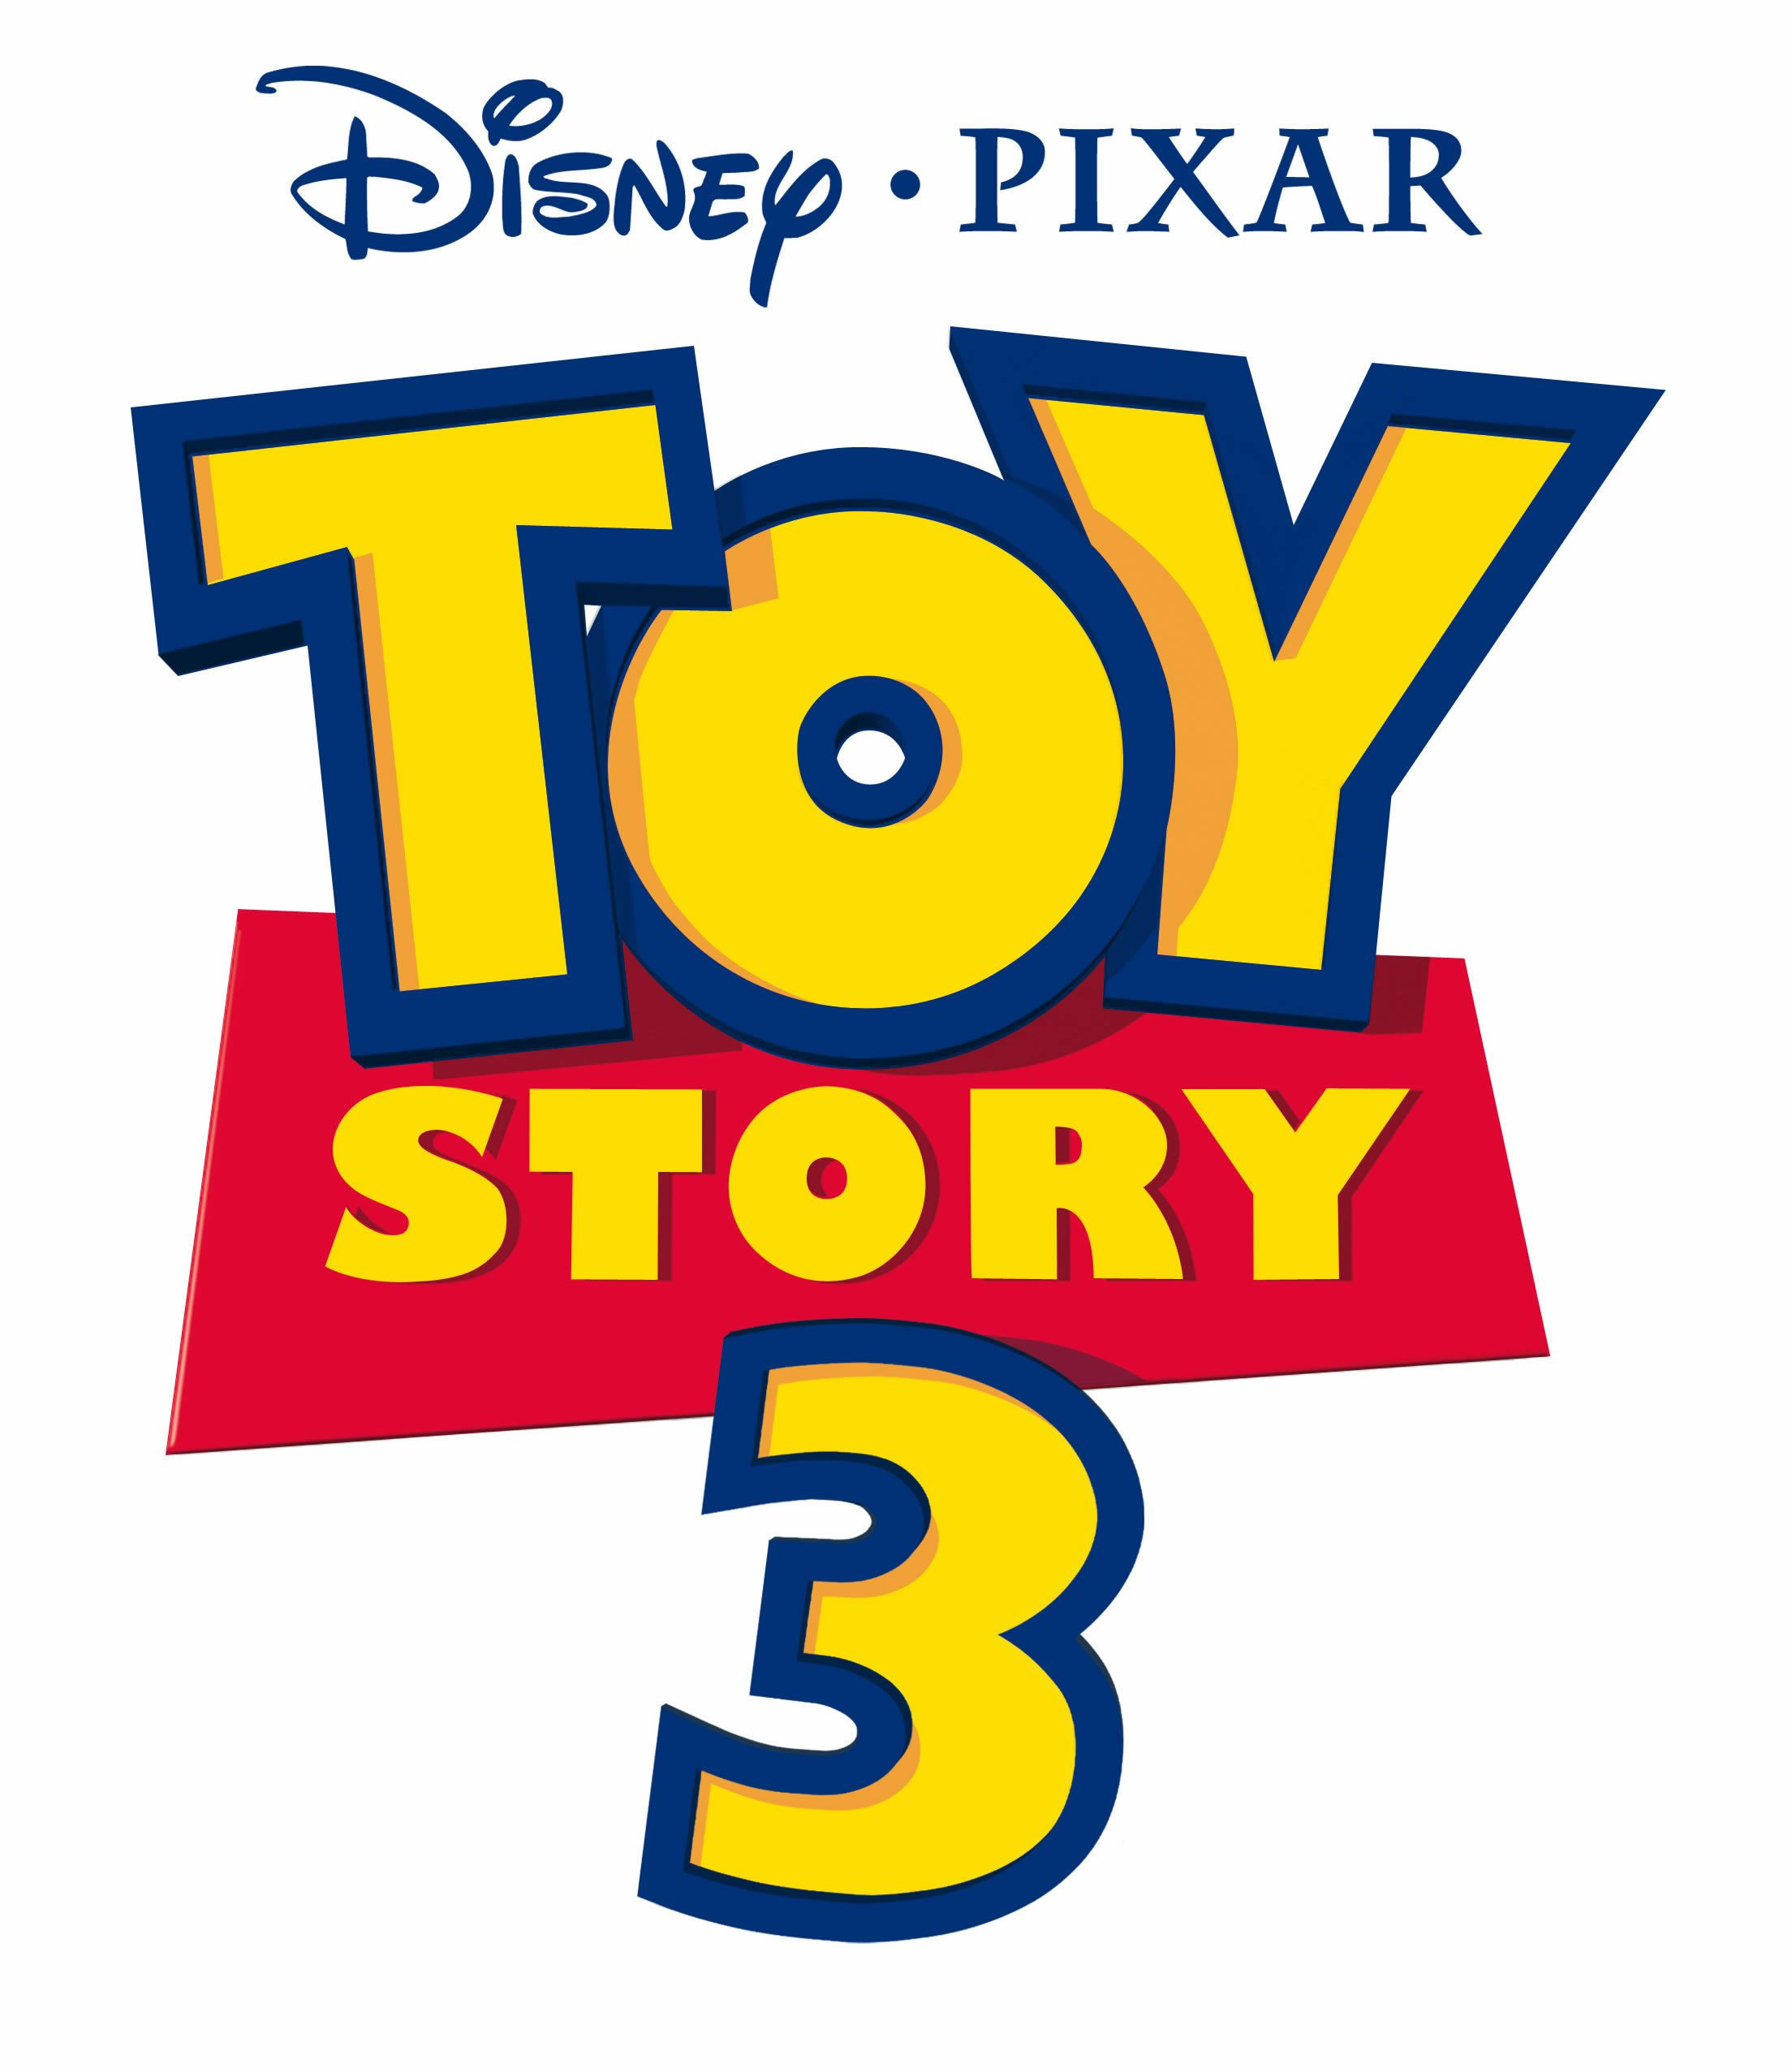 creation station toy story font 3rd bday party pinterest rh pinterest co uk toy story 2 logo font toy story logo font free